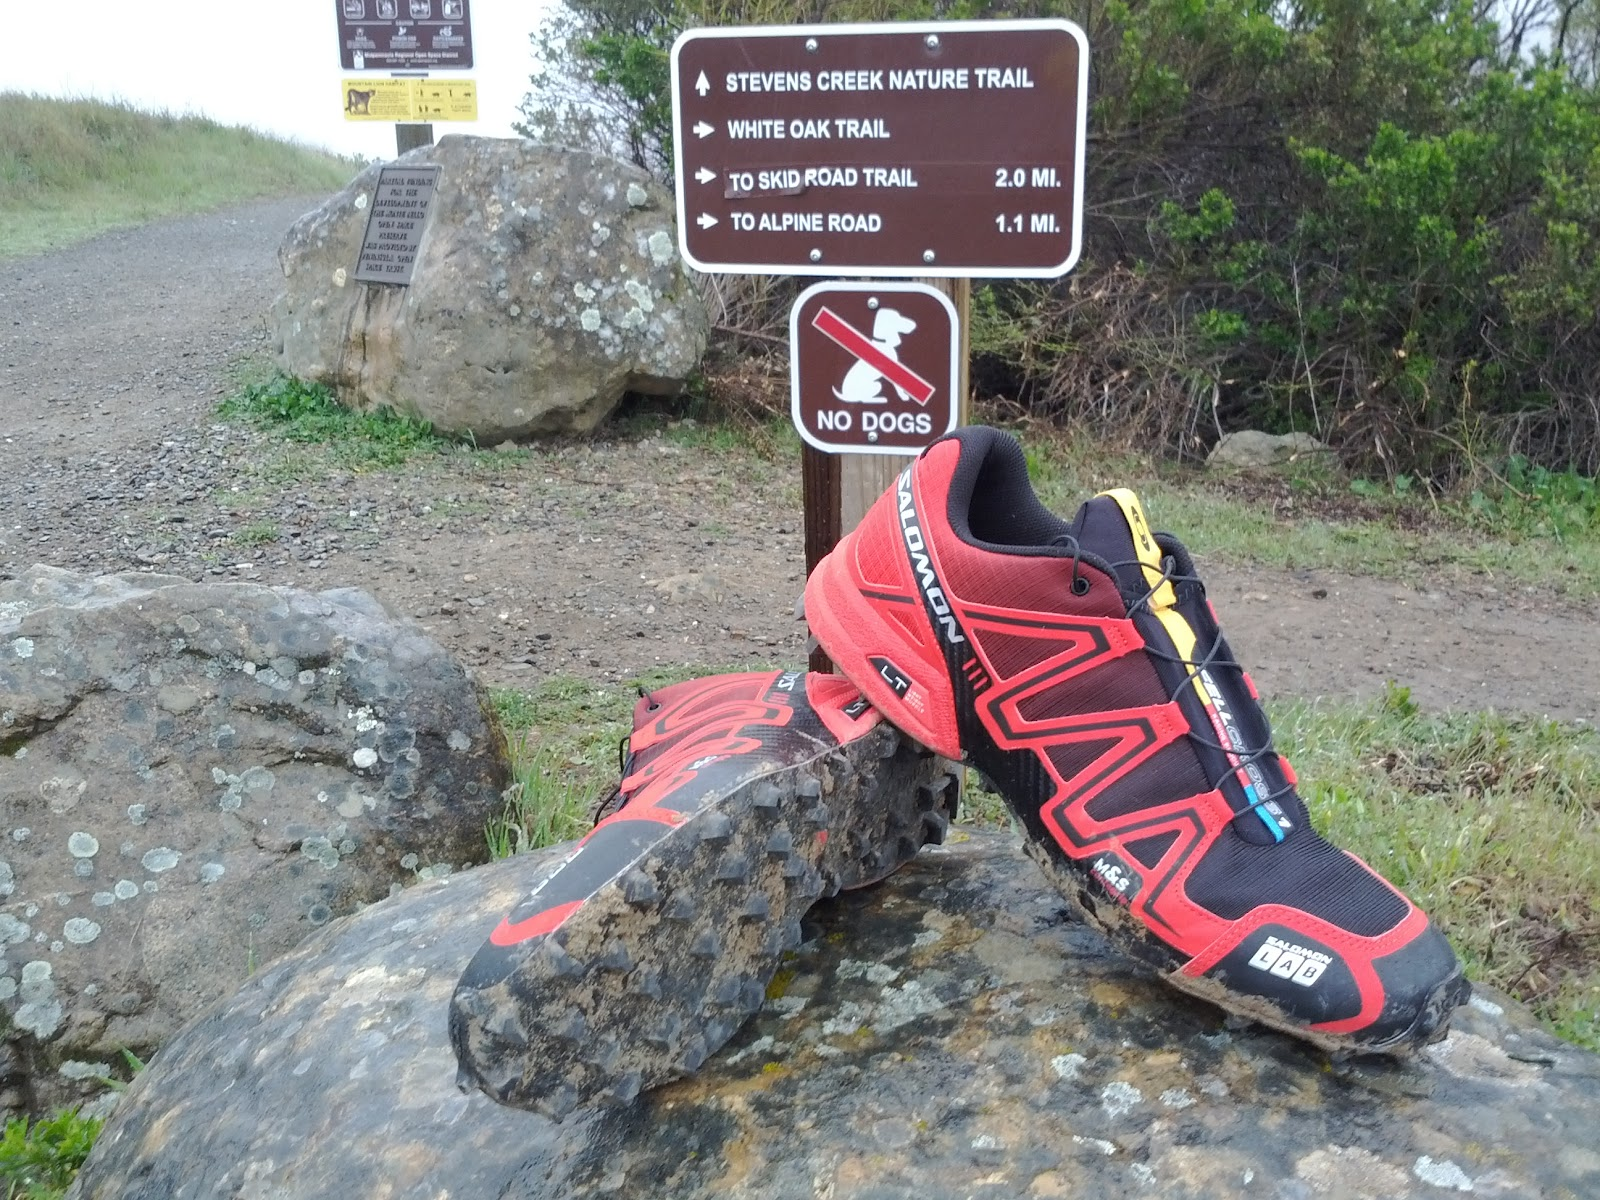 Richard Bolt Runs Drizzle Drazzle Rainy Muddy 15 Mile